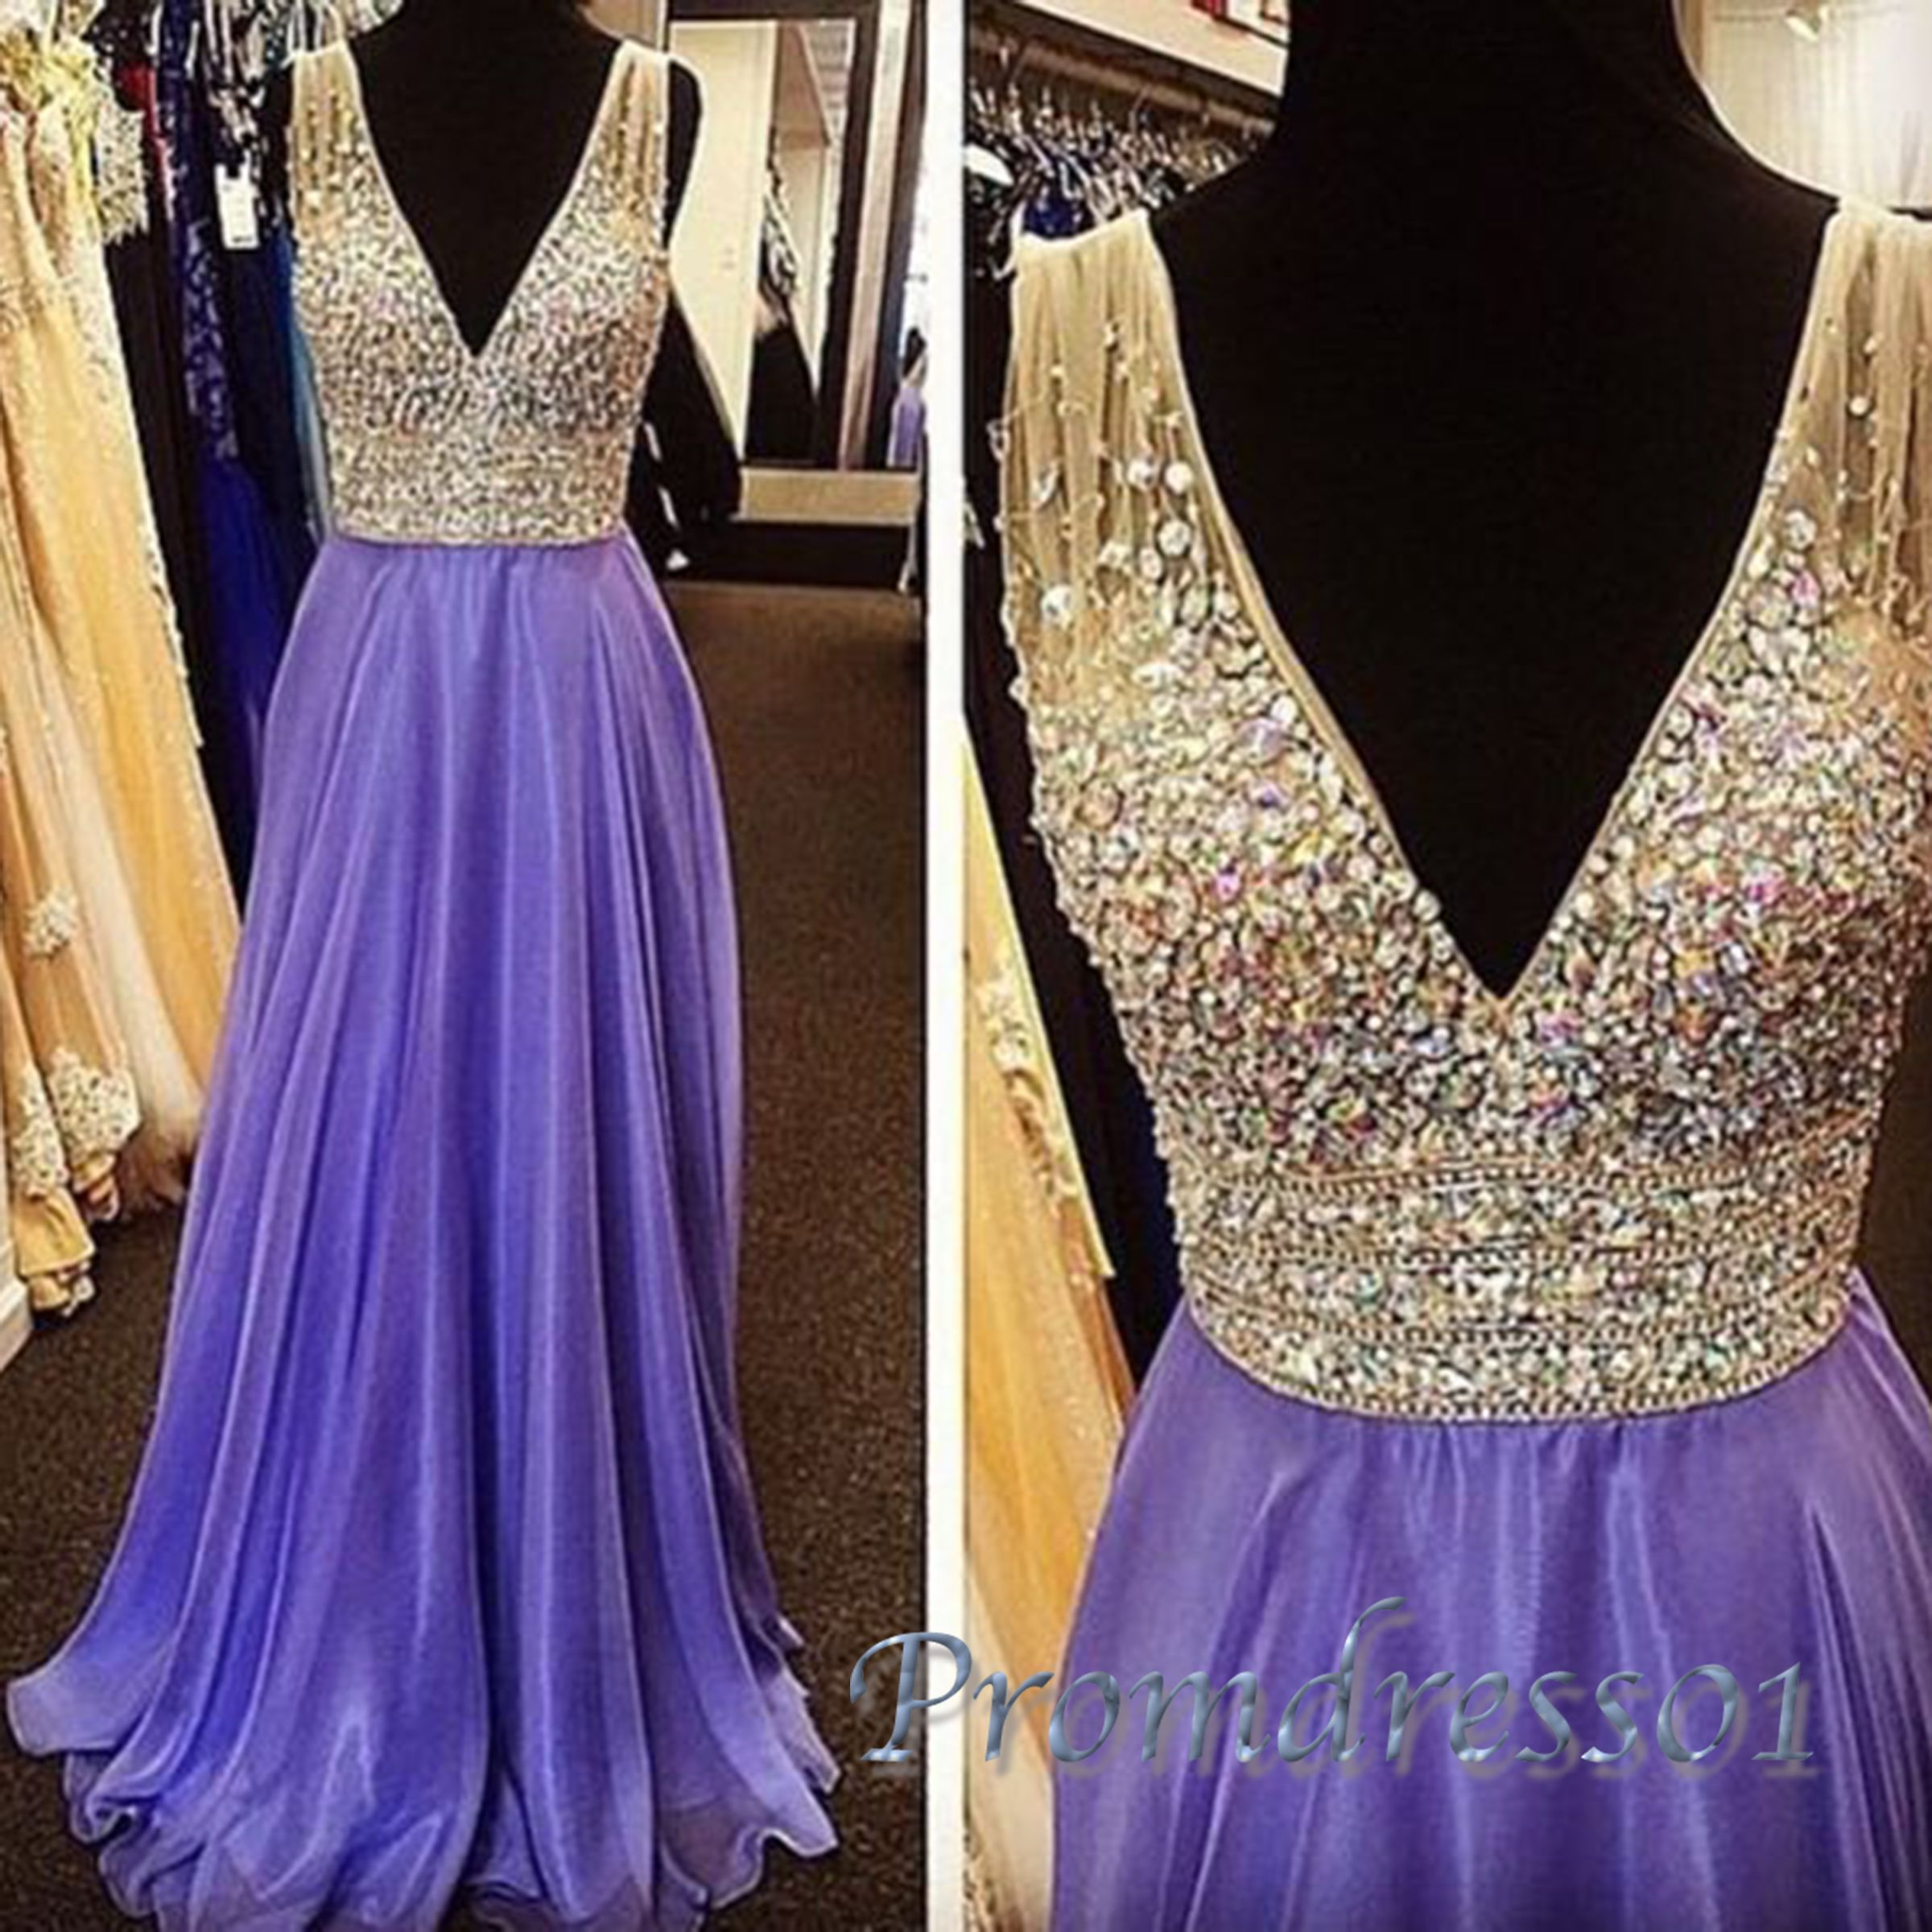 Elegant deepv beaded purple chiffon prom dress for teens long